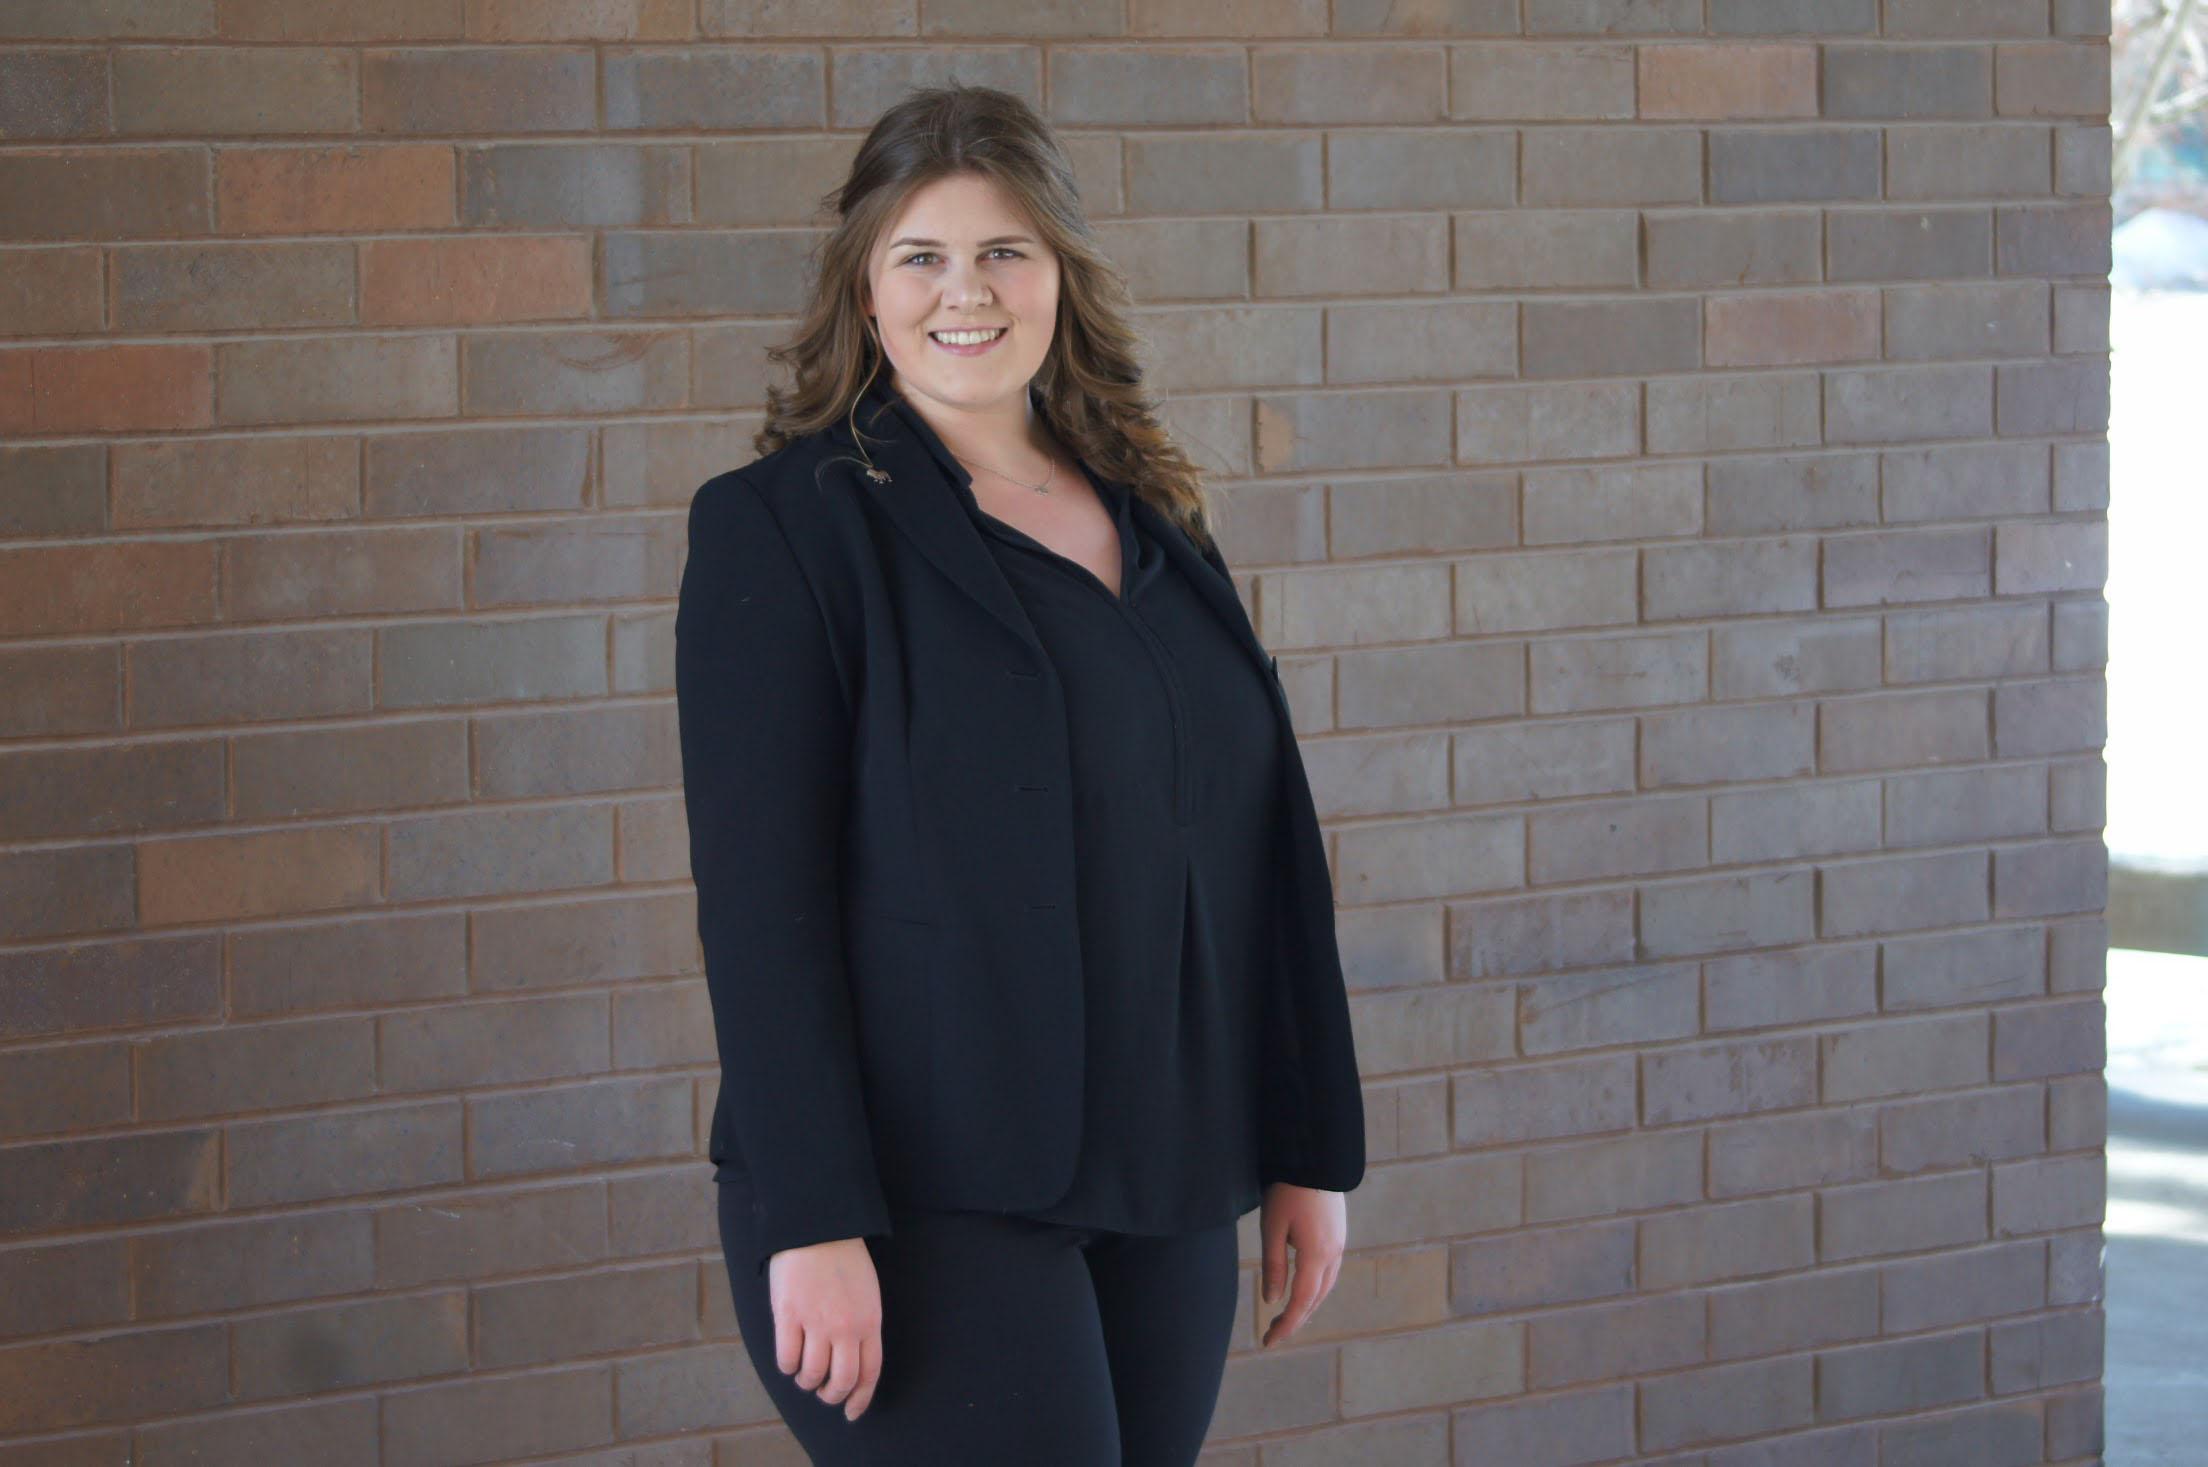 Giada Morresi - Student Body President Candidate